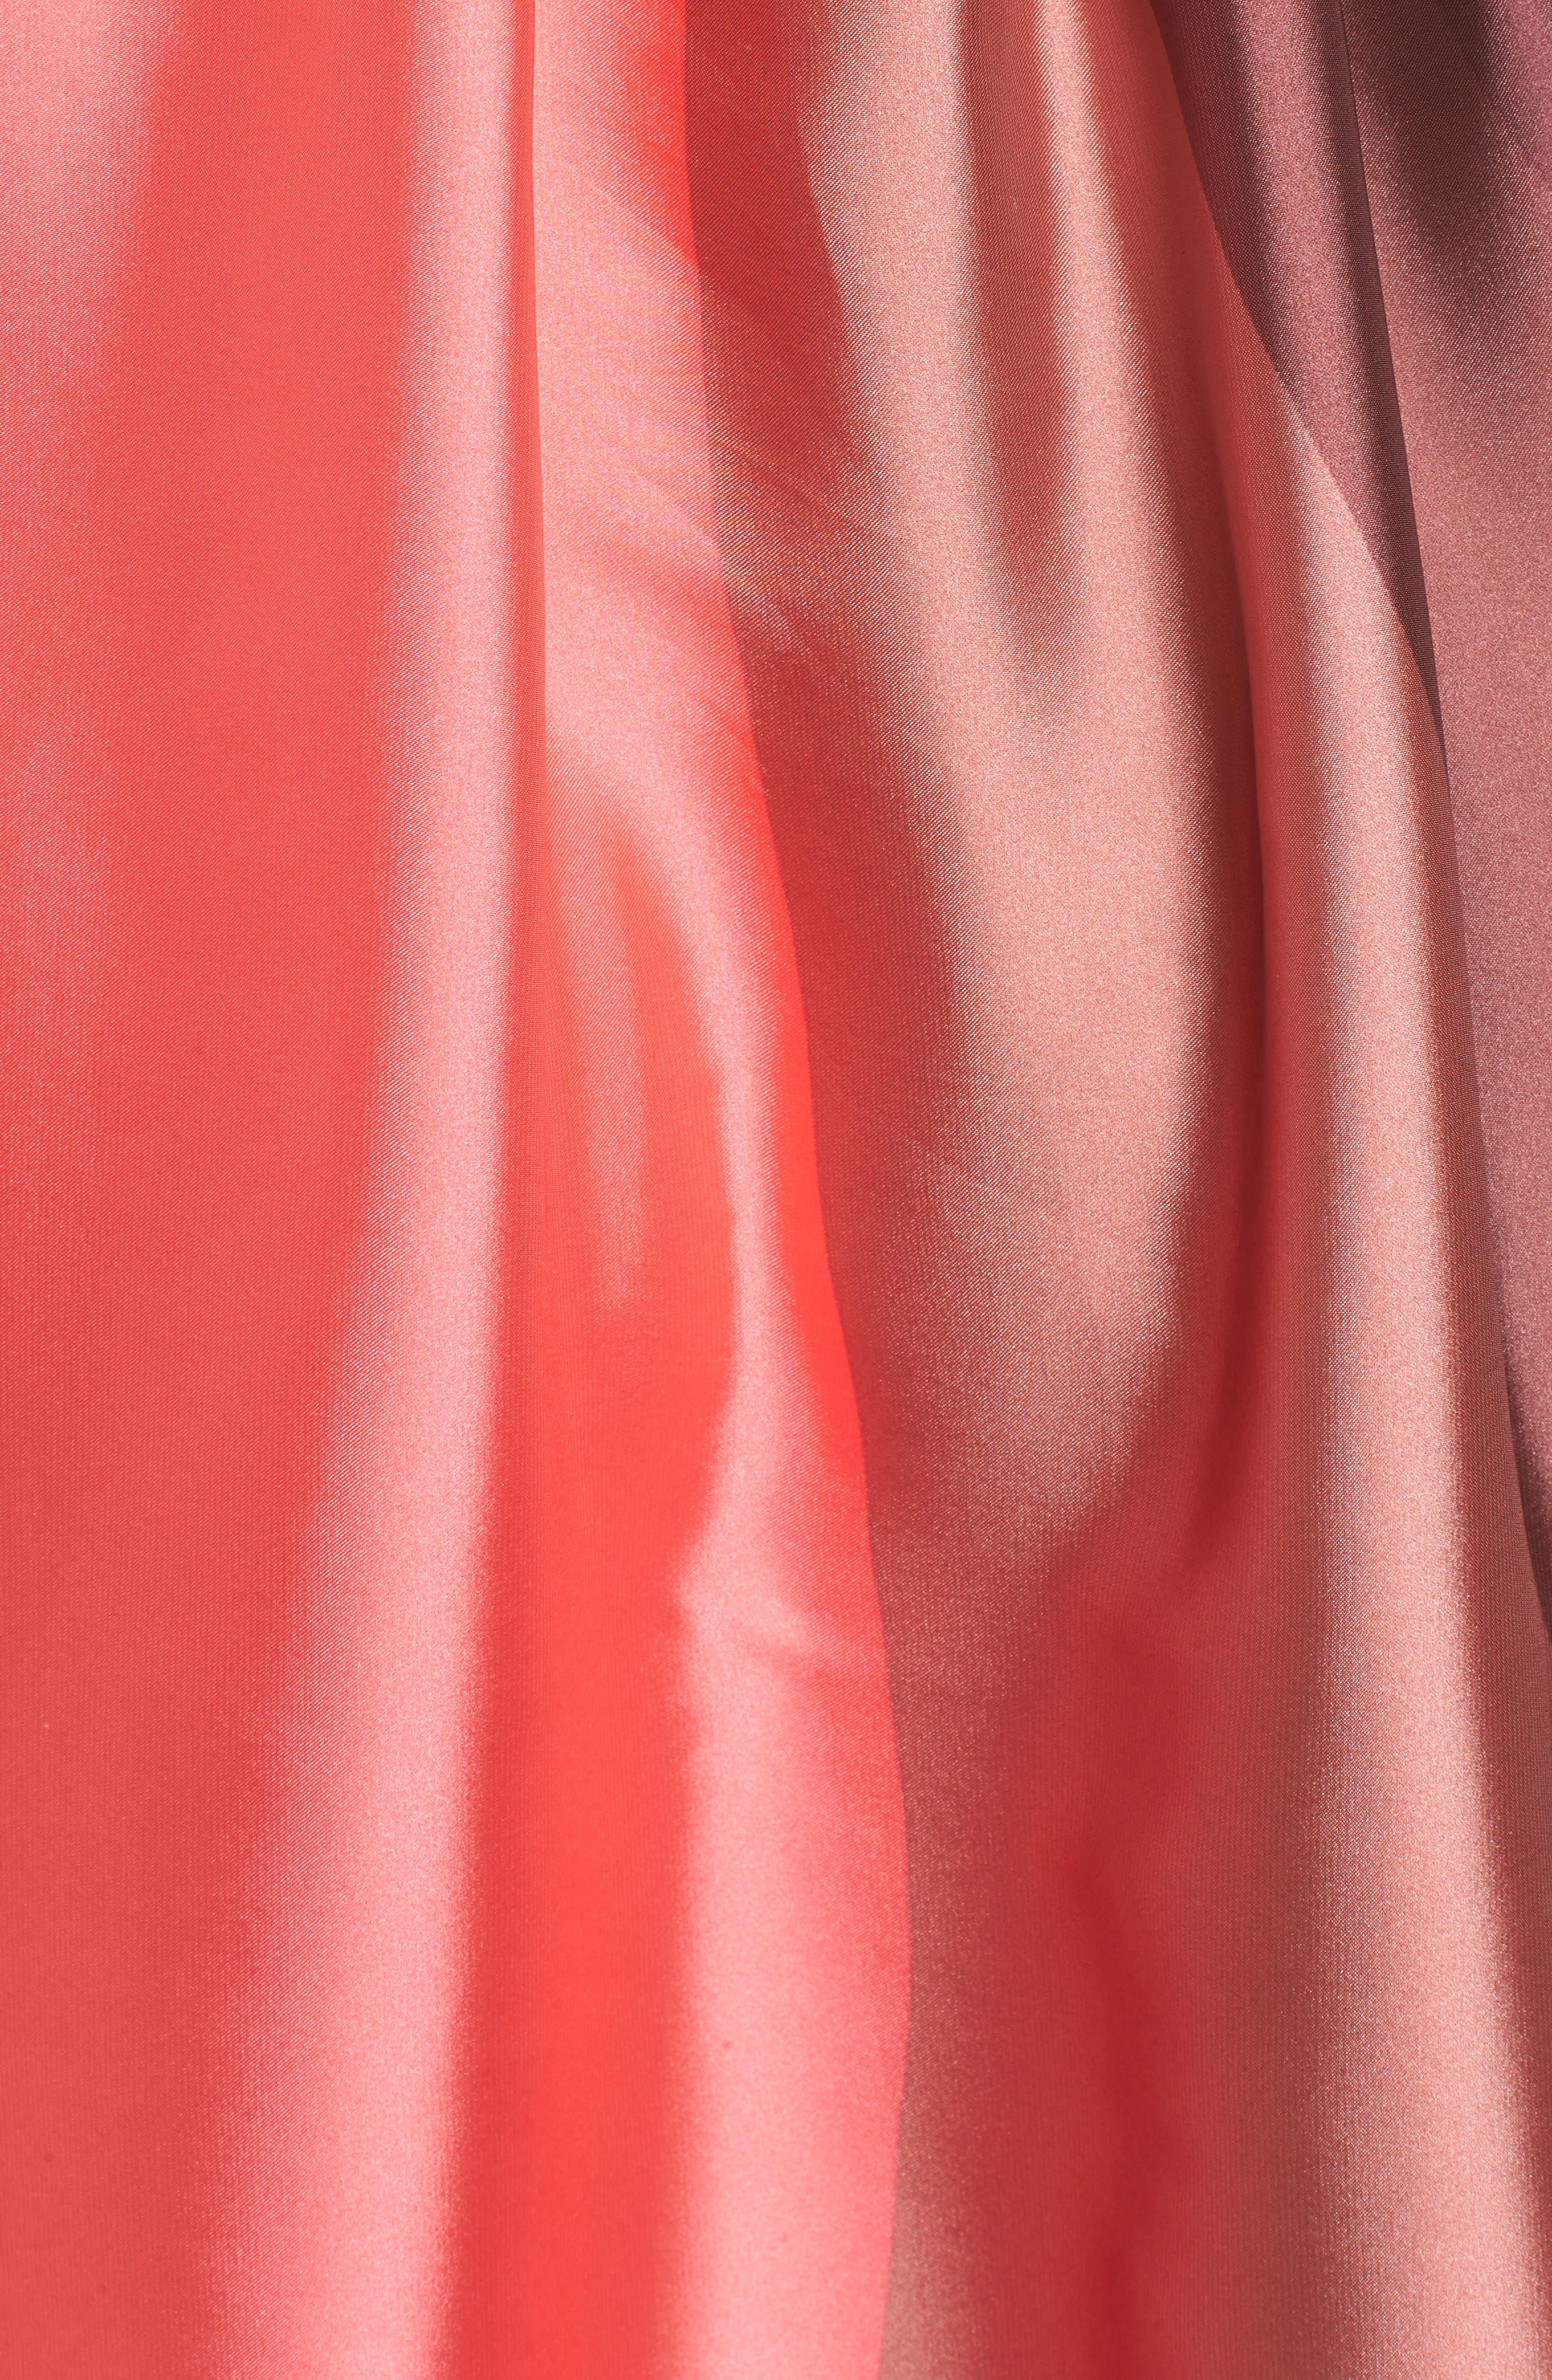 Icy Shores Maxi Dress,                             Alternate thumbnail 5, color,                             Multi